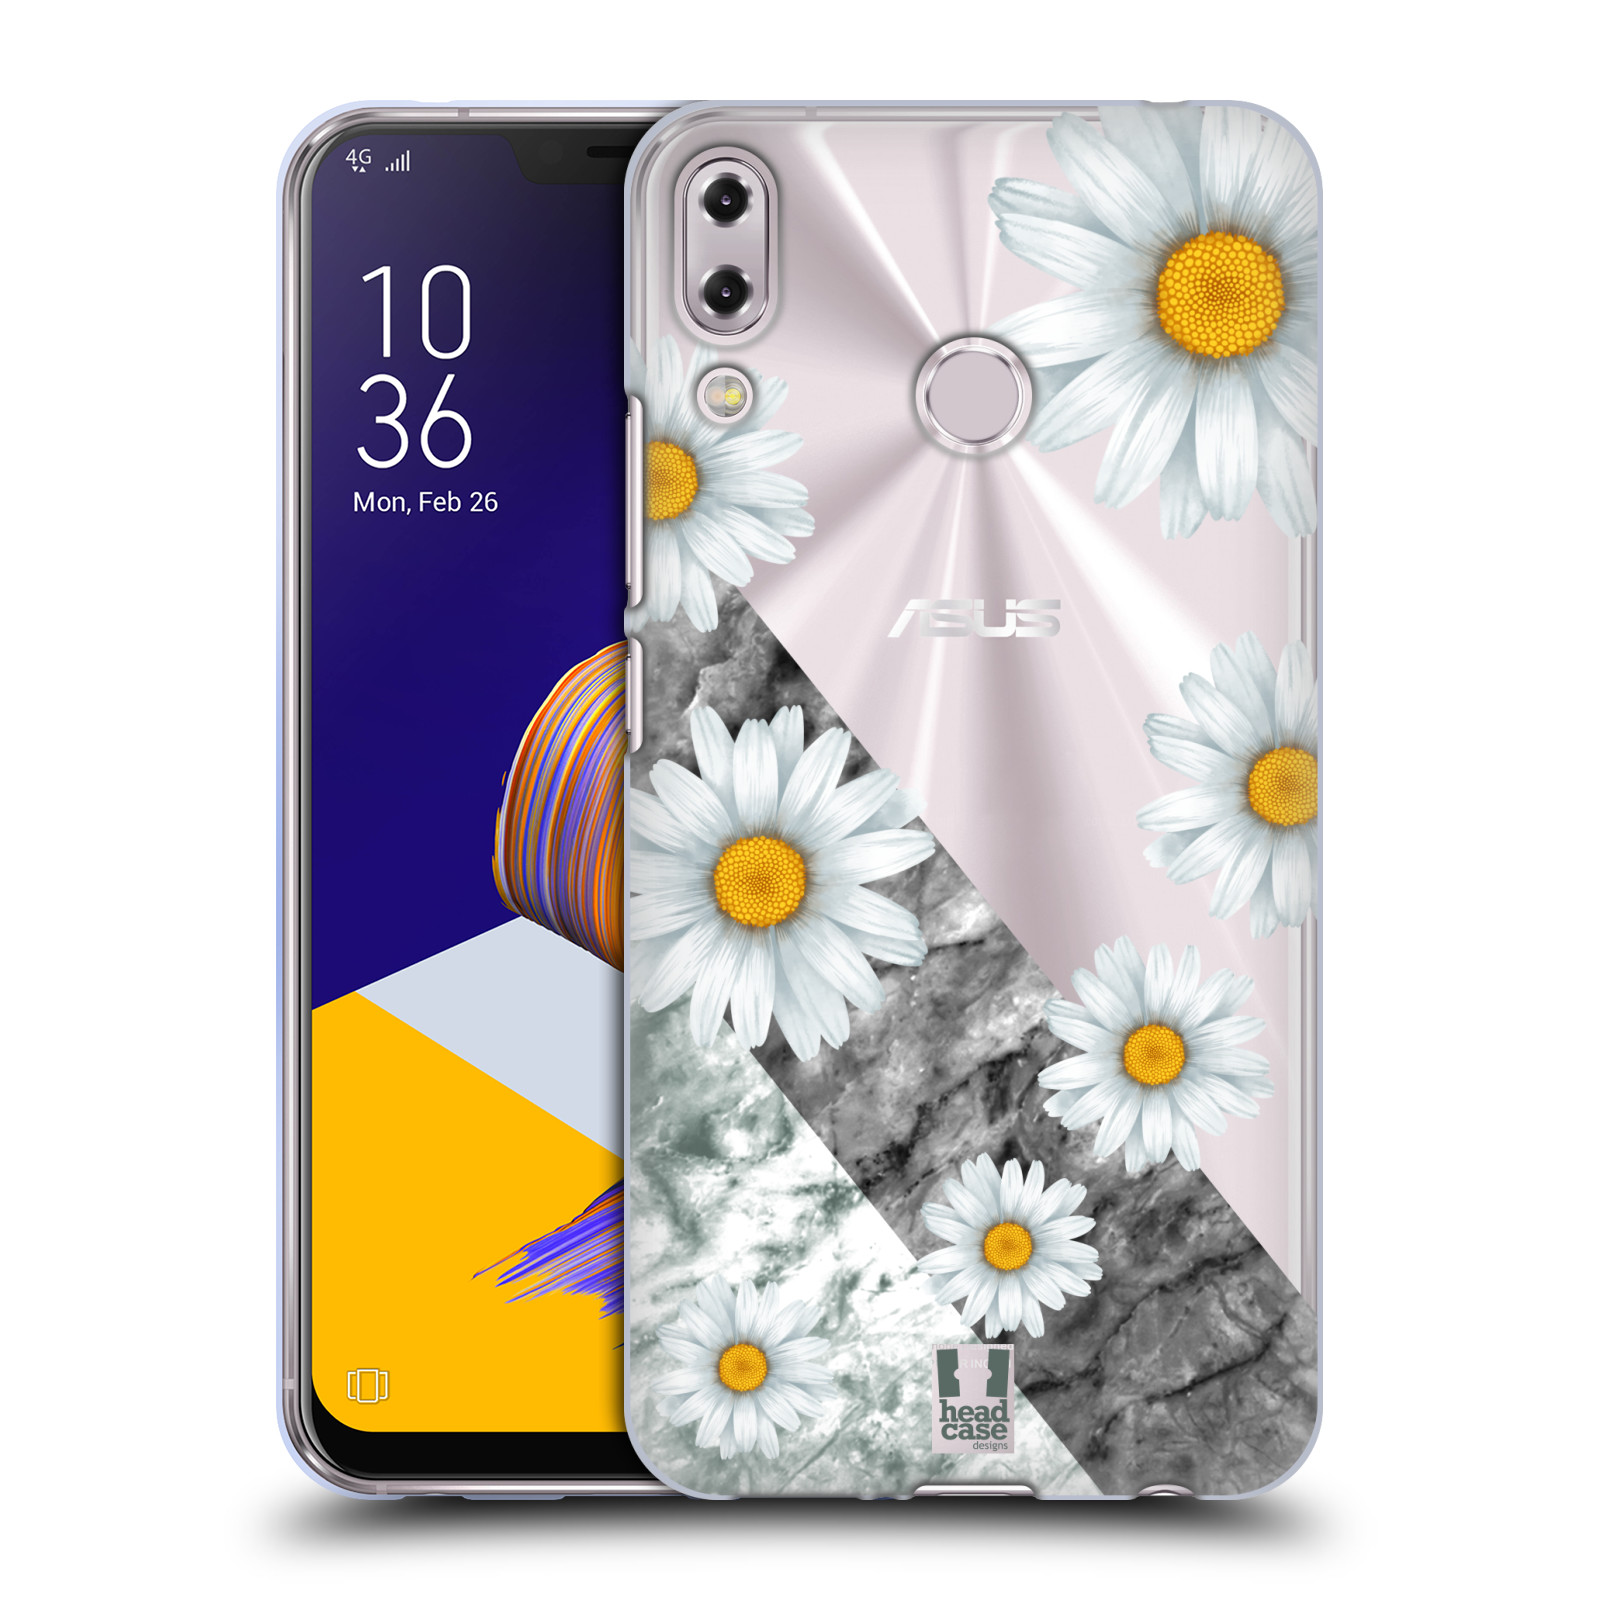 Silikonové pouzdro na mobil Asus Zenfone 5z ZS620KL - Head Case - Kopretiny a mramor